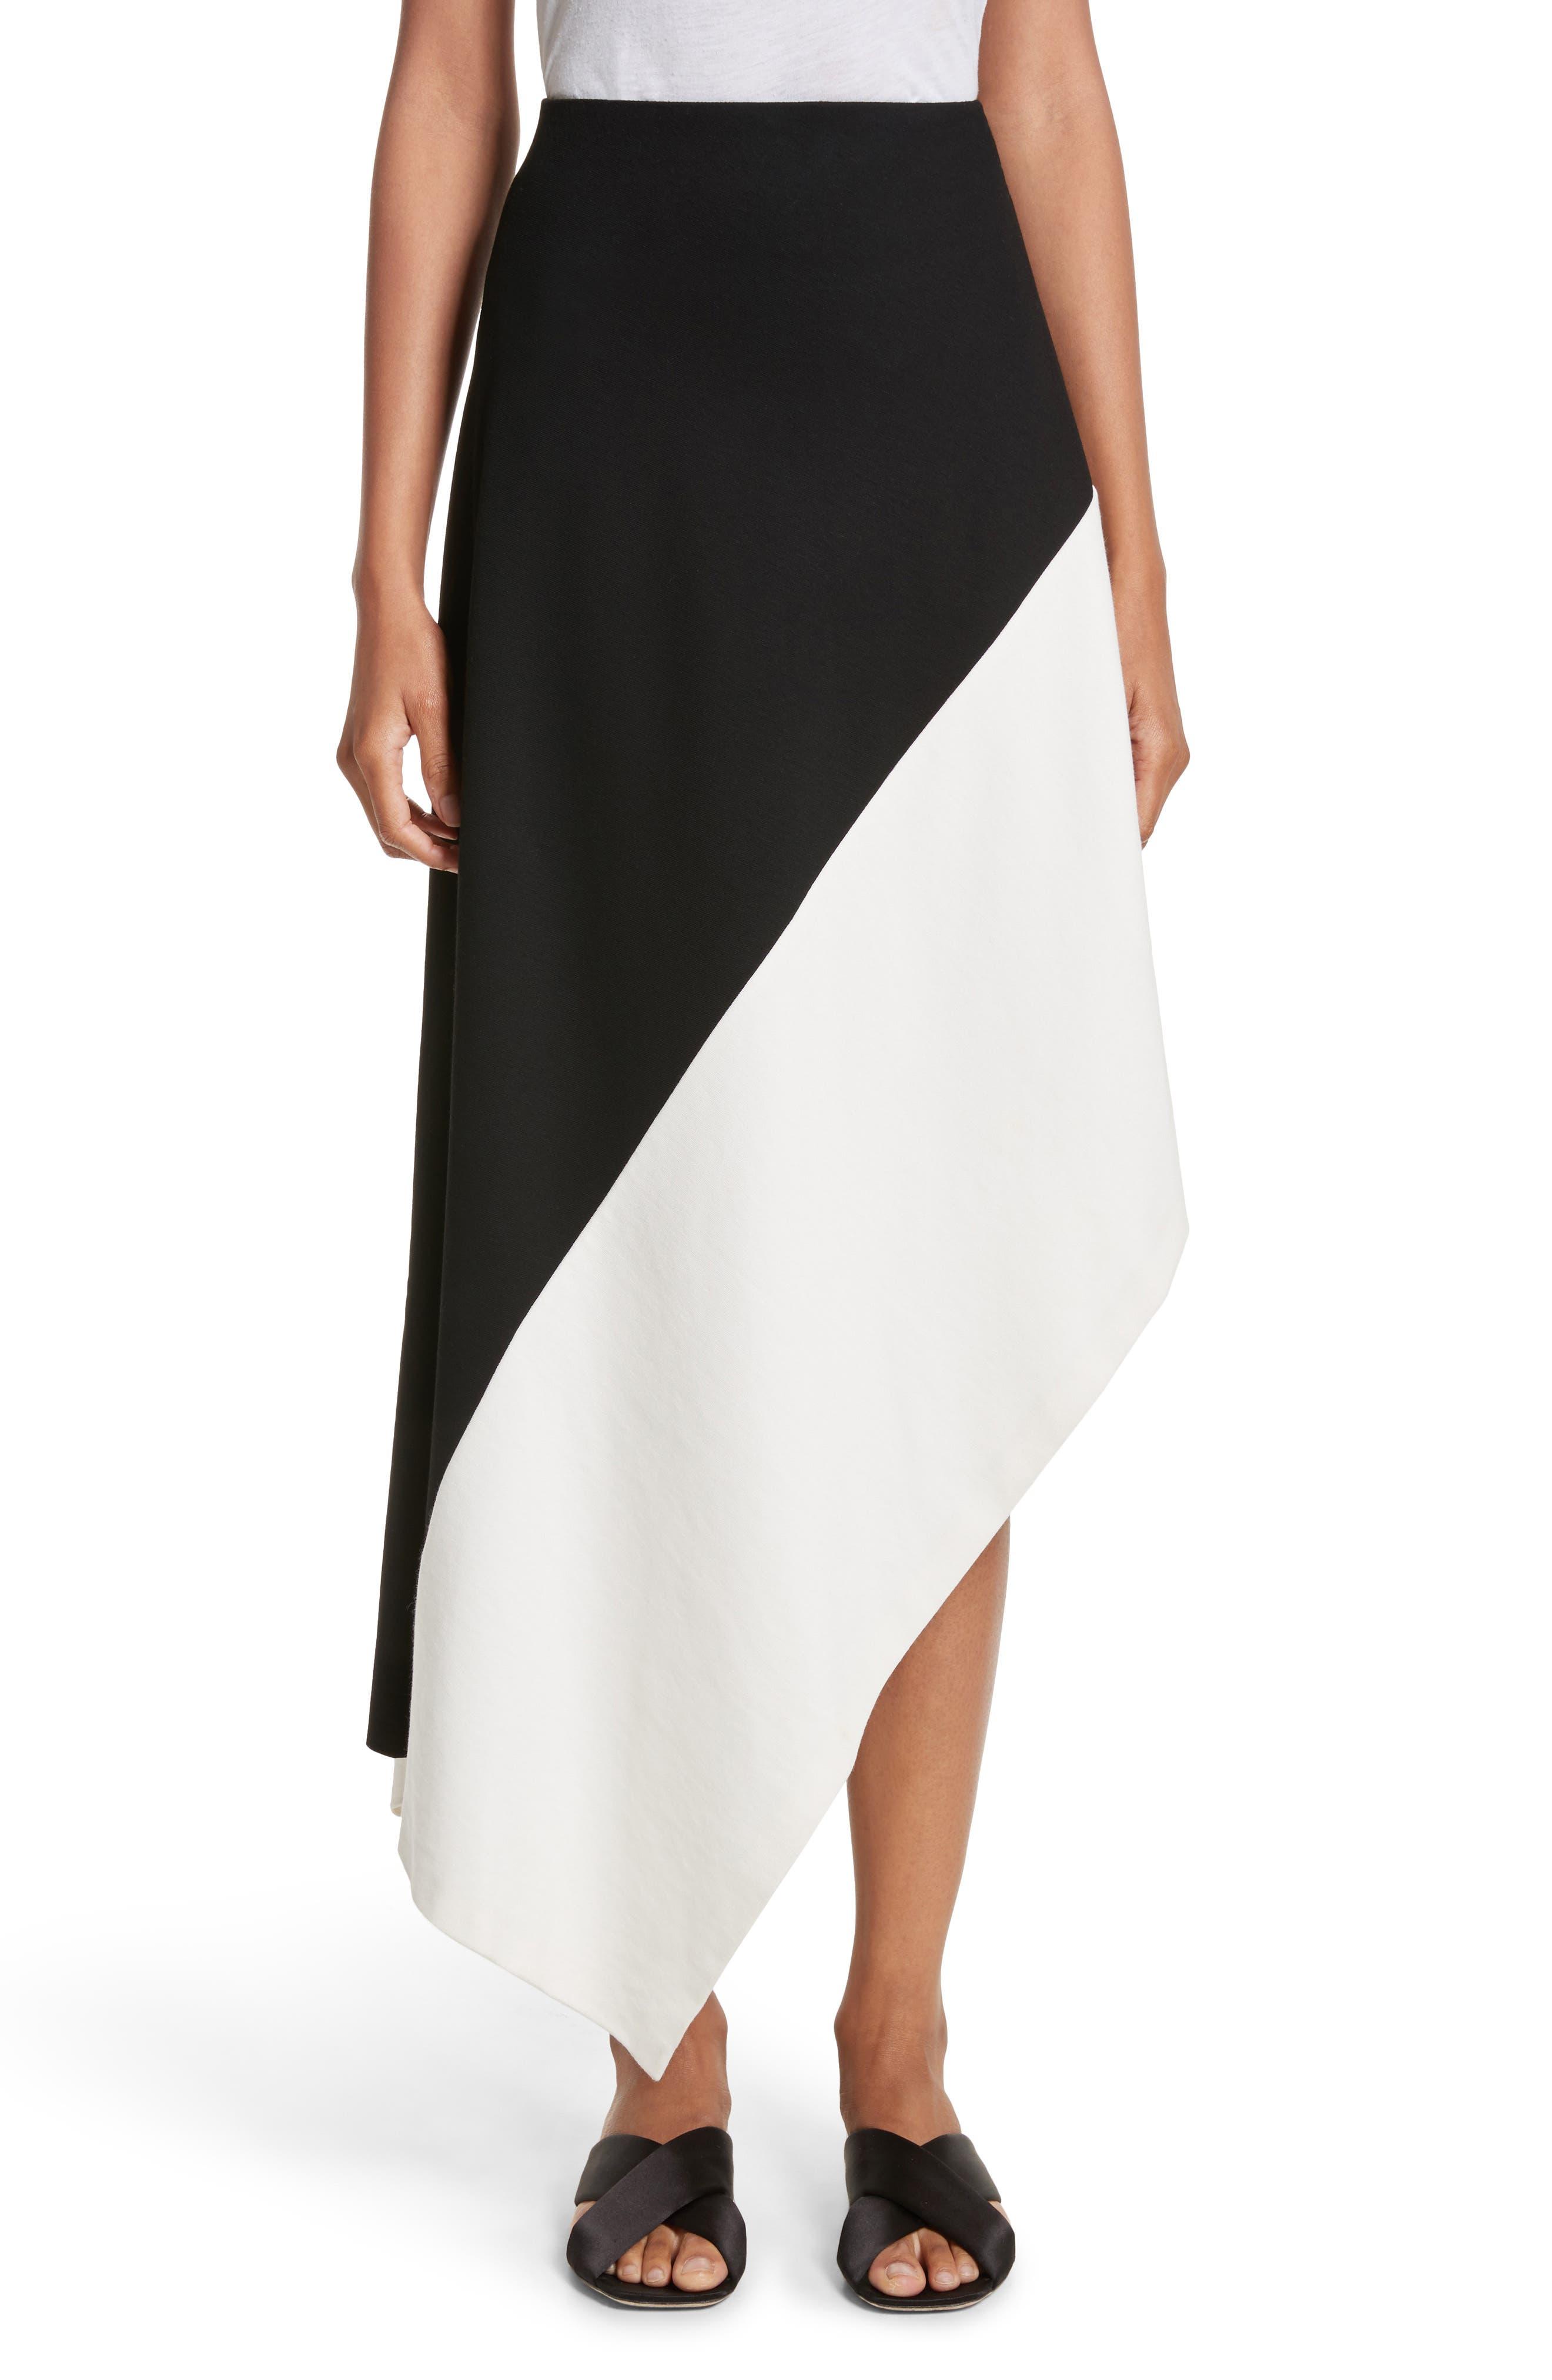 Alternate Image 1 Selected - Rosetta Getty Slashed Panel Jersey Skirt